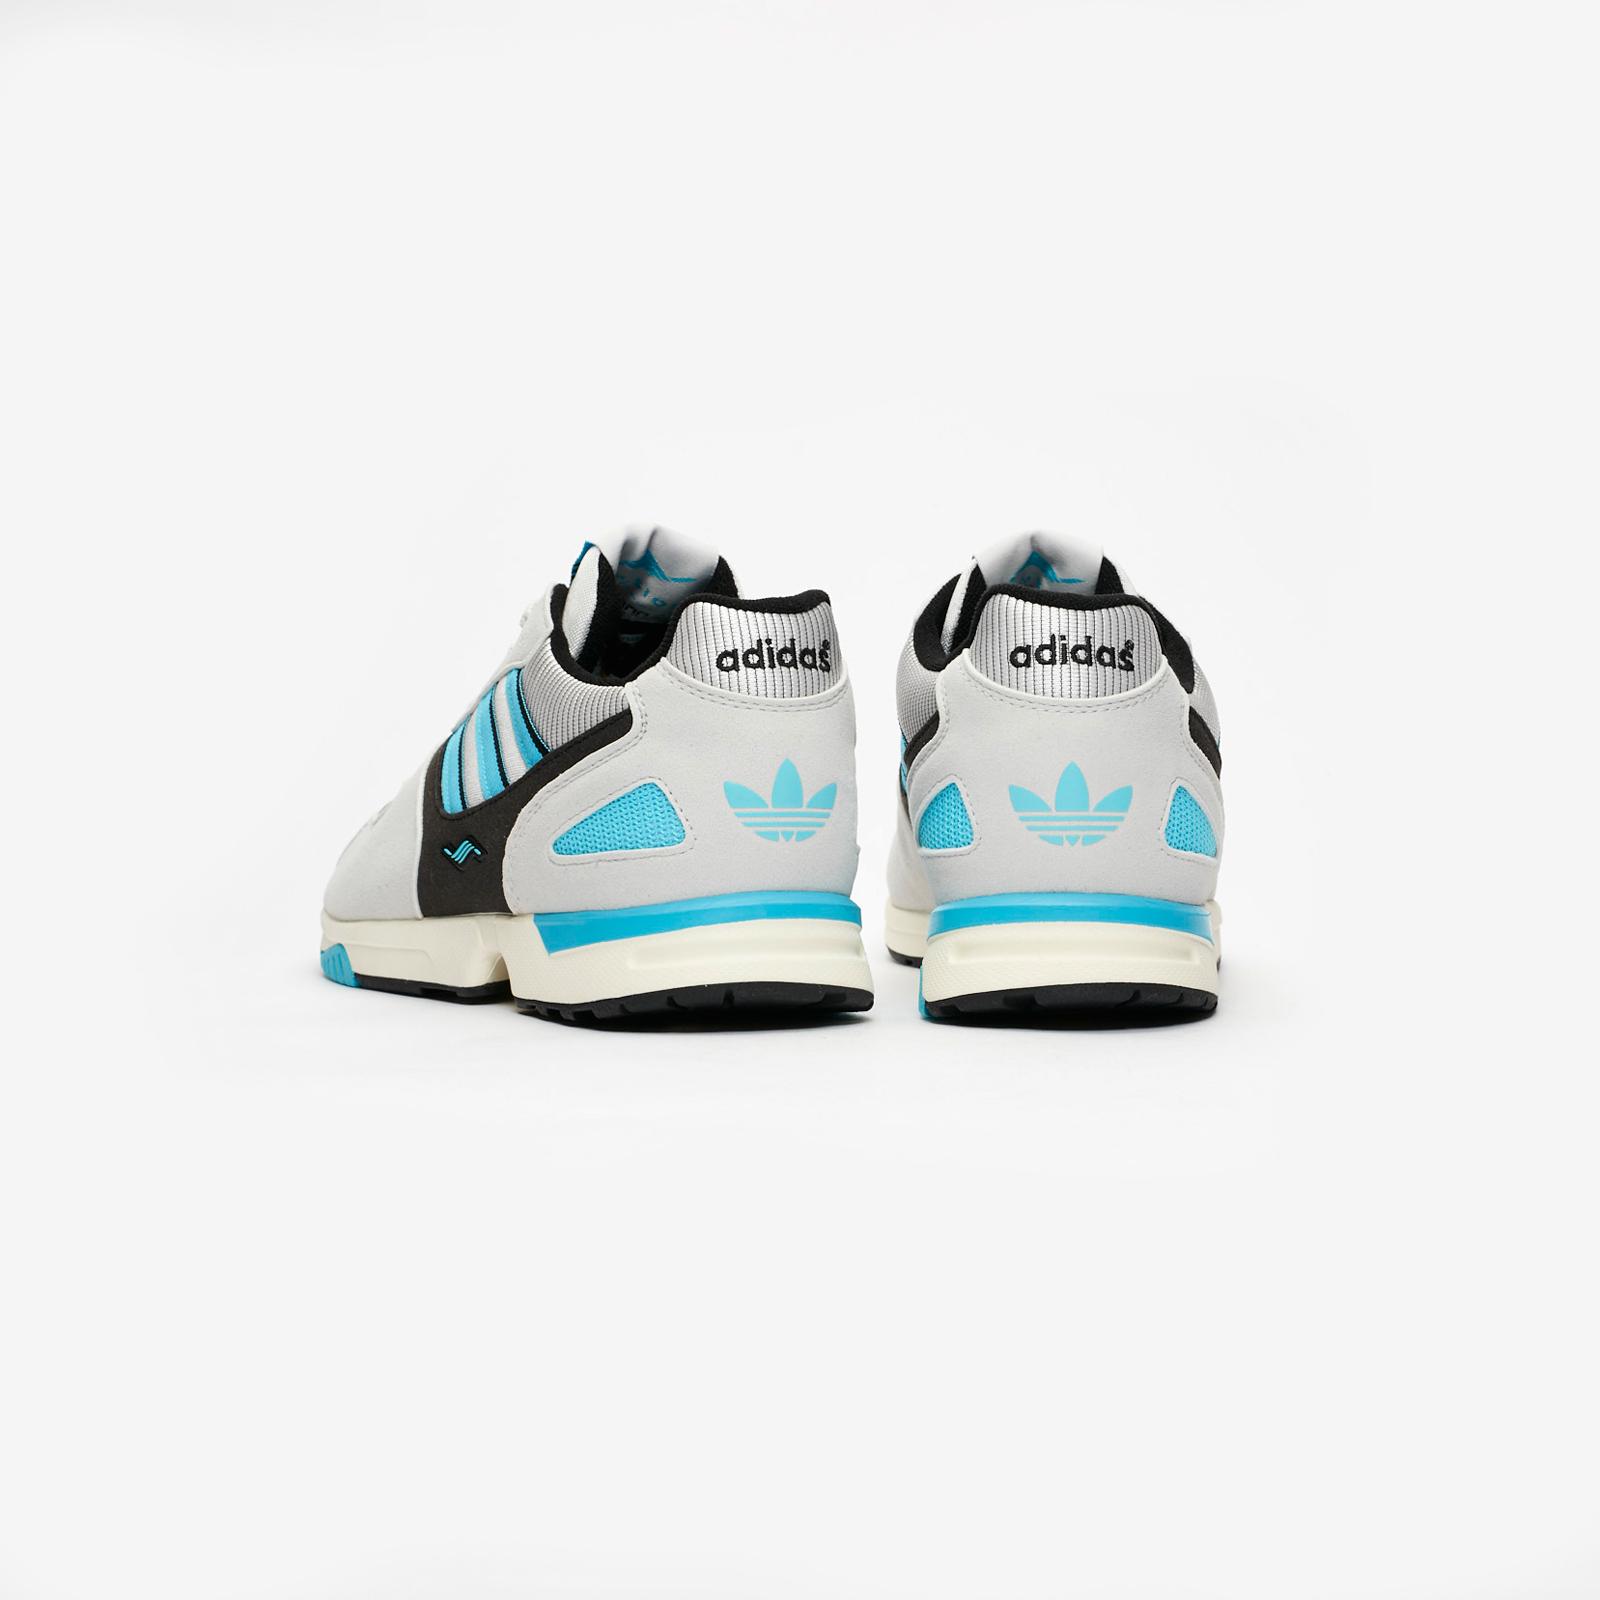 newest c1611 197f1 adidas ZX 4000 x Consortium - D97734 - Sneakersnstuff   sneakers    streetwear online since 1999